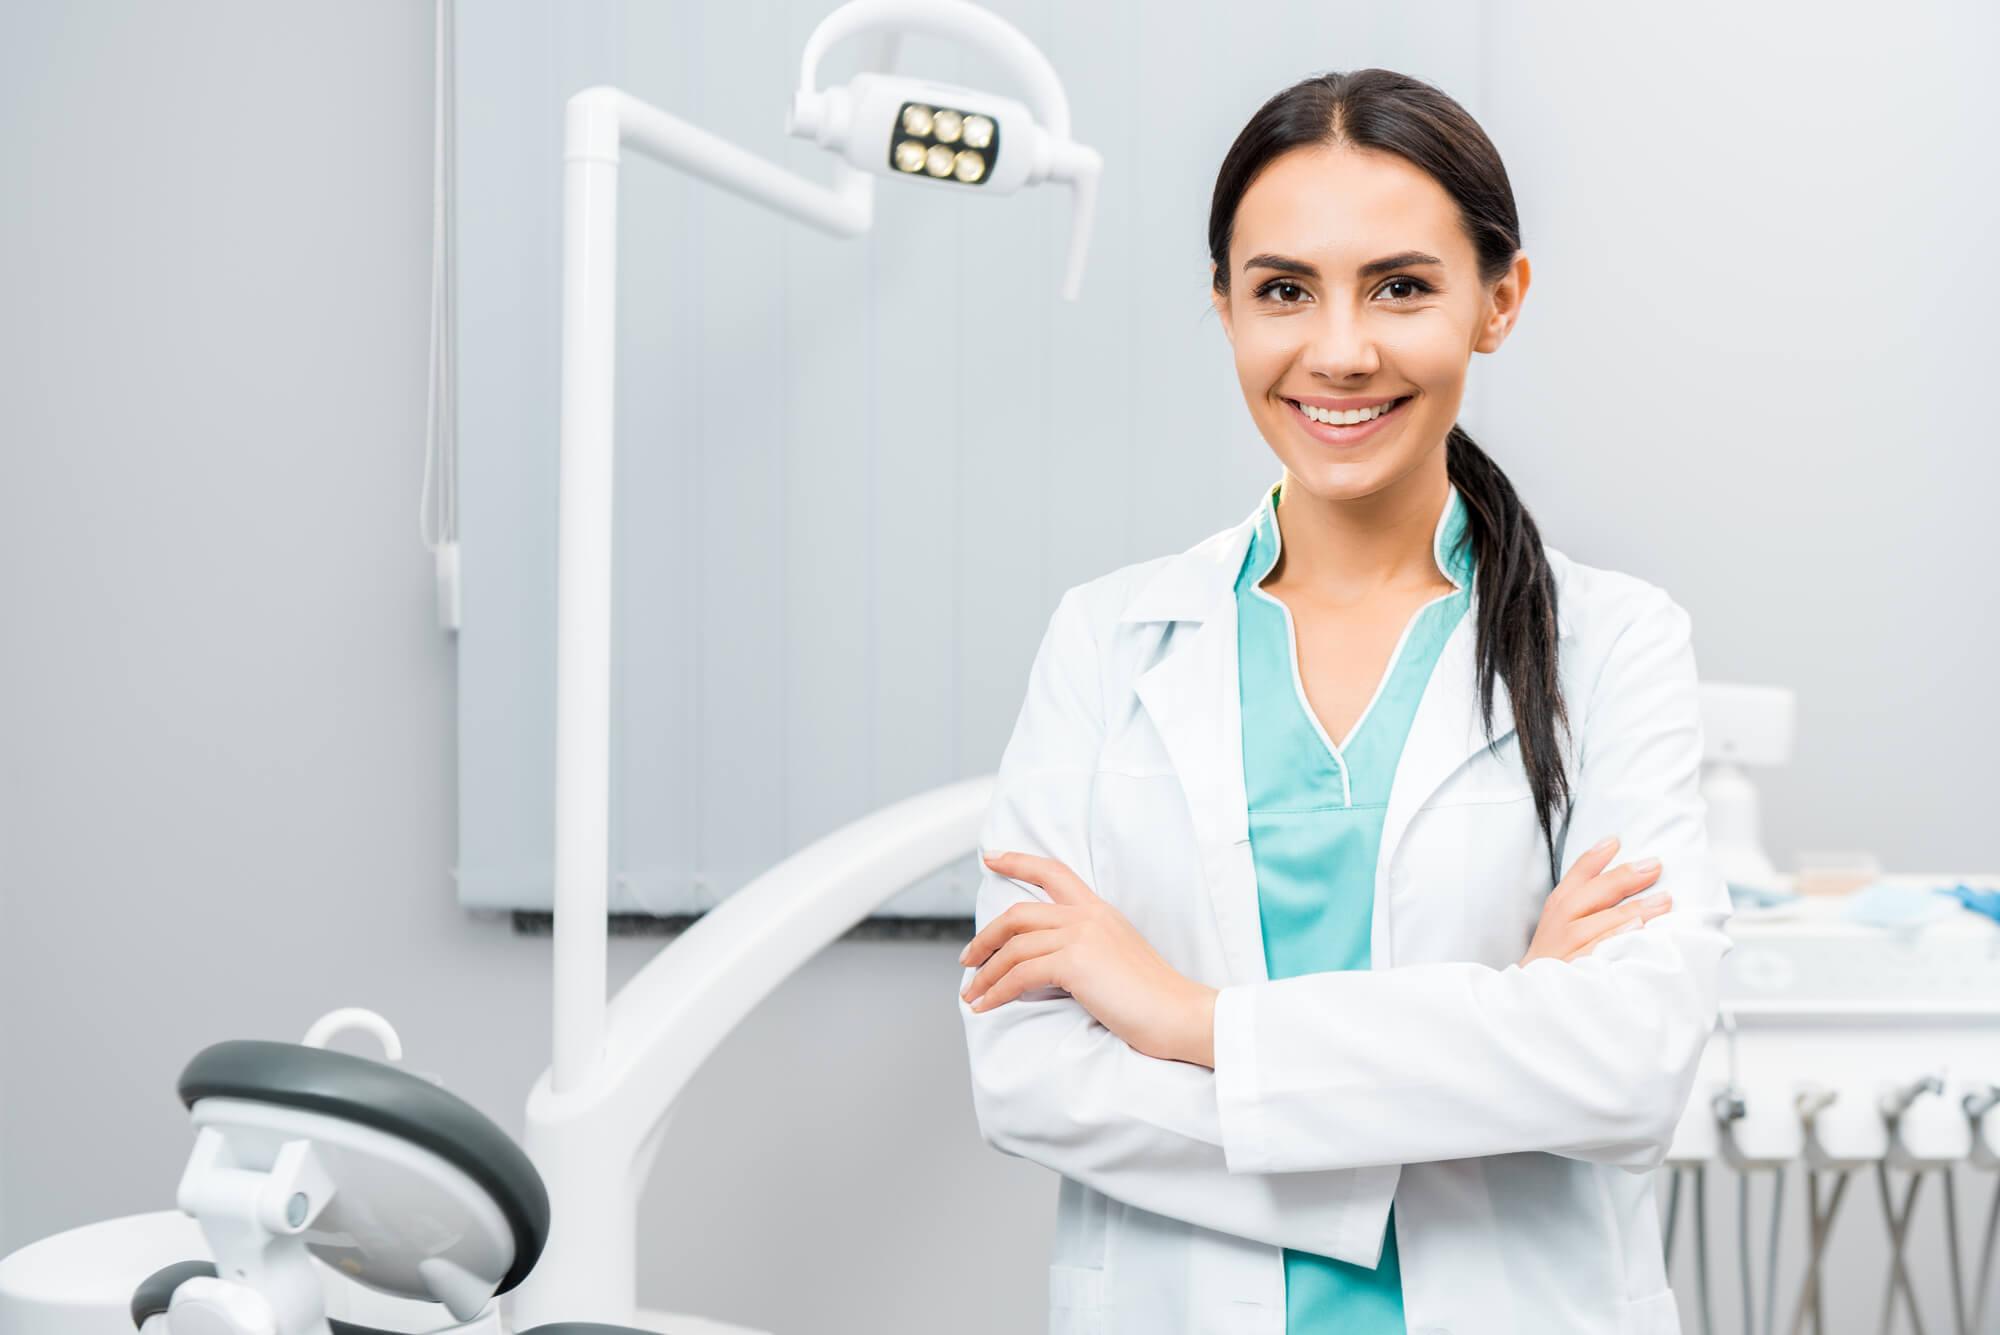 dentist applying for Periodontist job openings